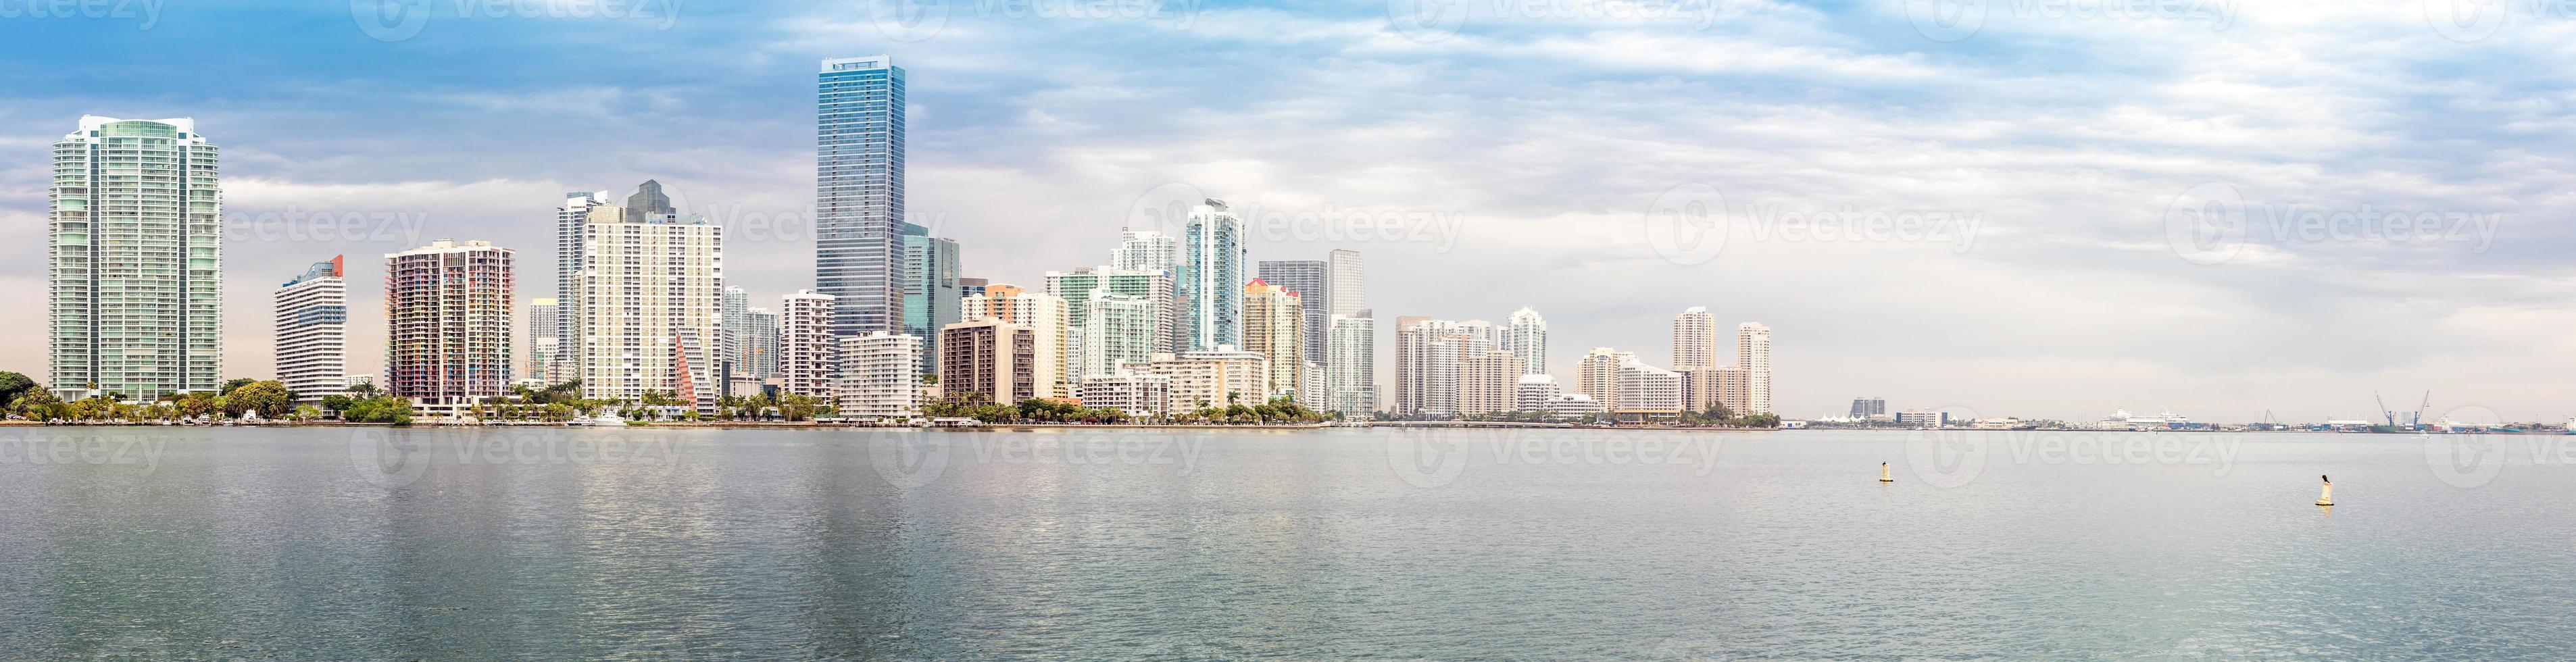 Panorama de l'horizon de Miami depuis la baie de Biscayne photo